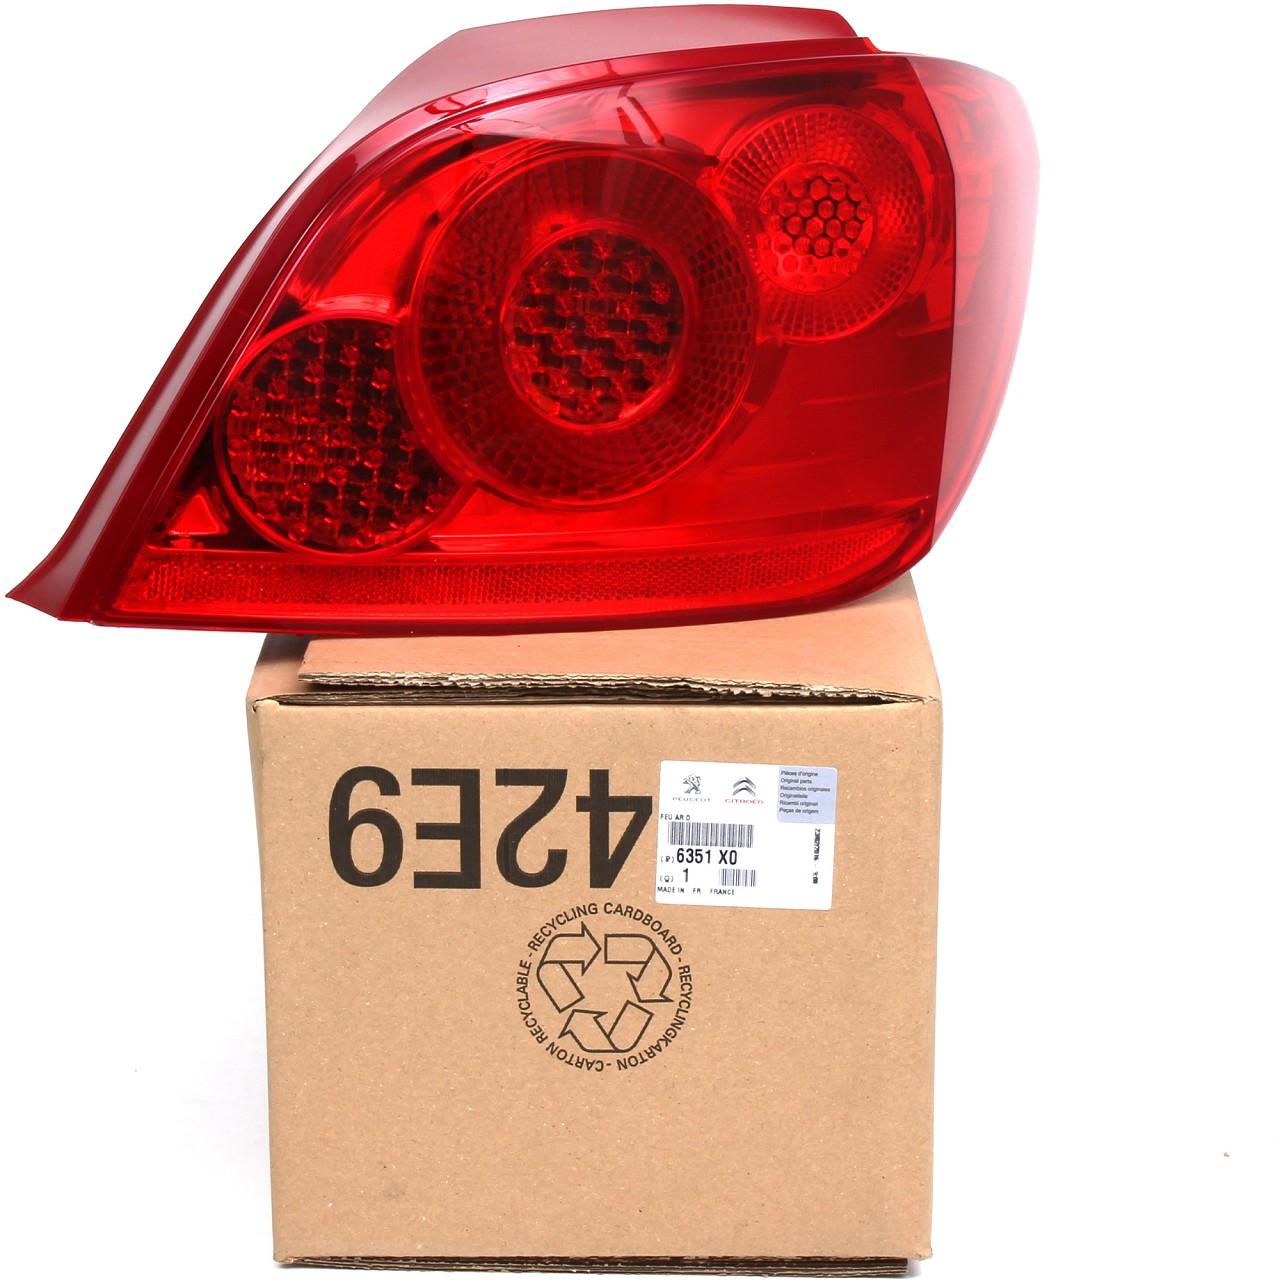 ORIGINAL Peugeot Heckleuchte Rückleuchte Rücklicht 307 Schrägheck rechts 6351.X0